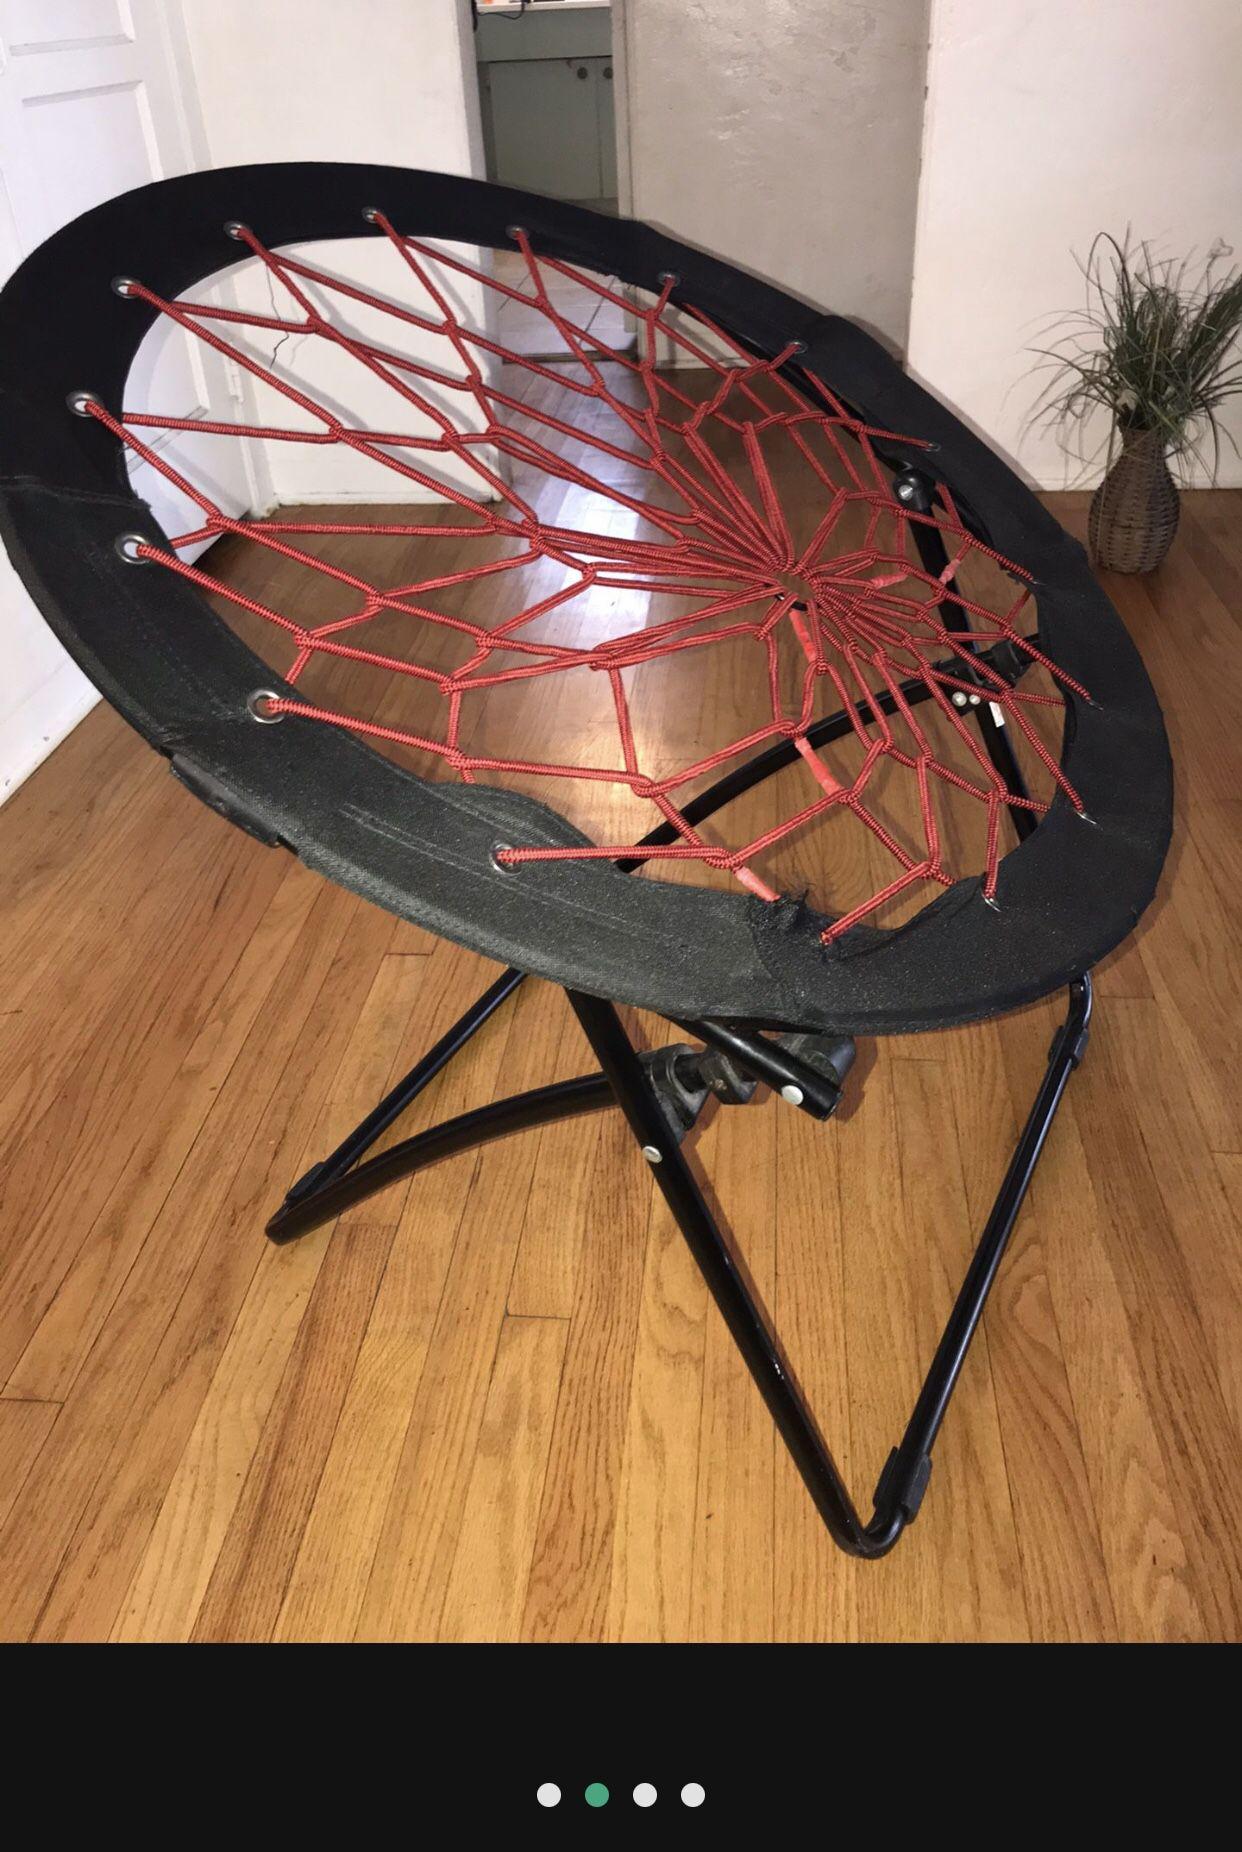 Bungee chair